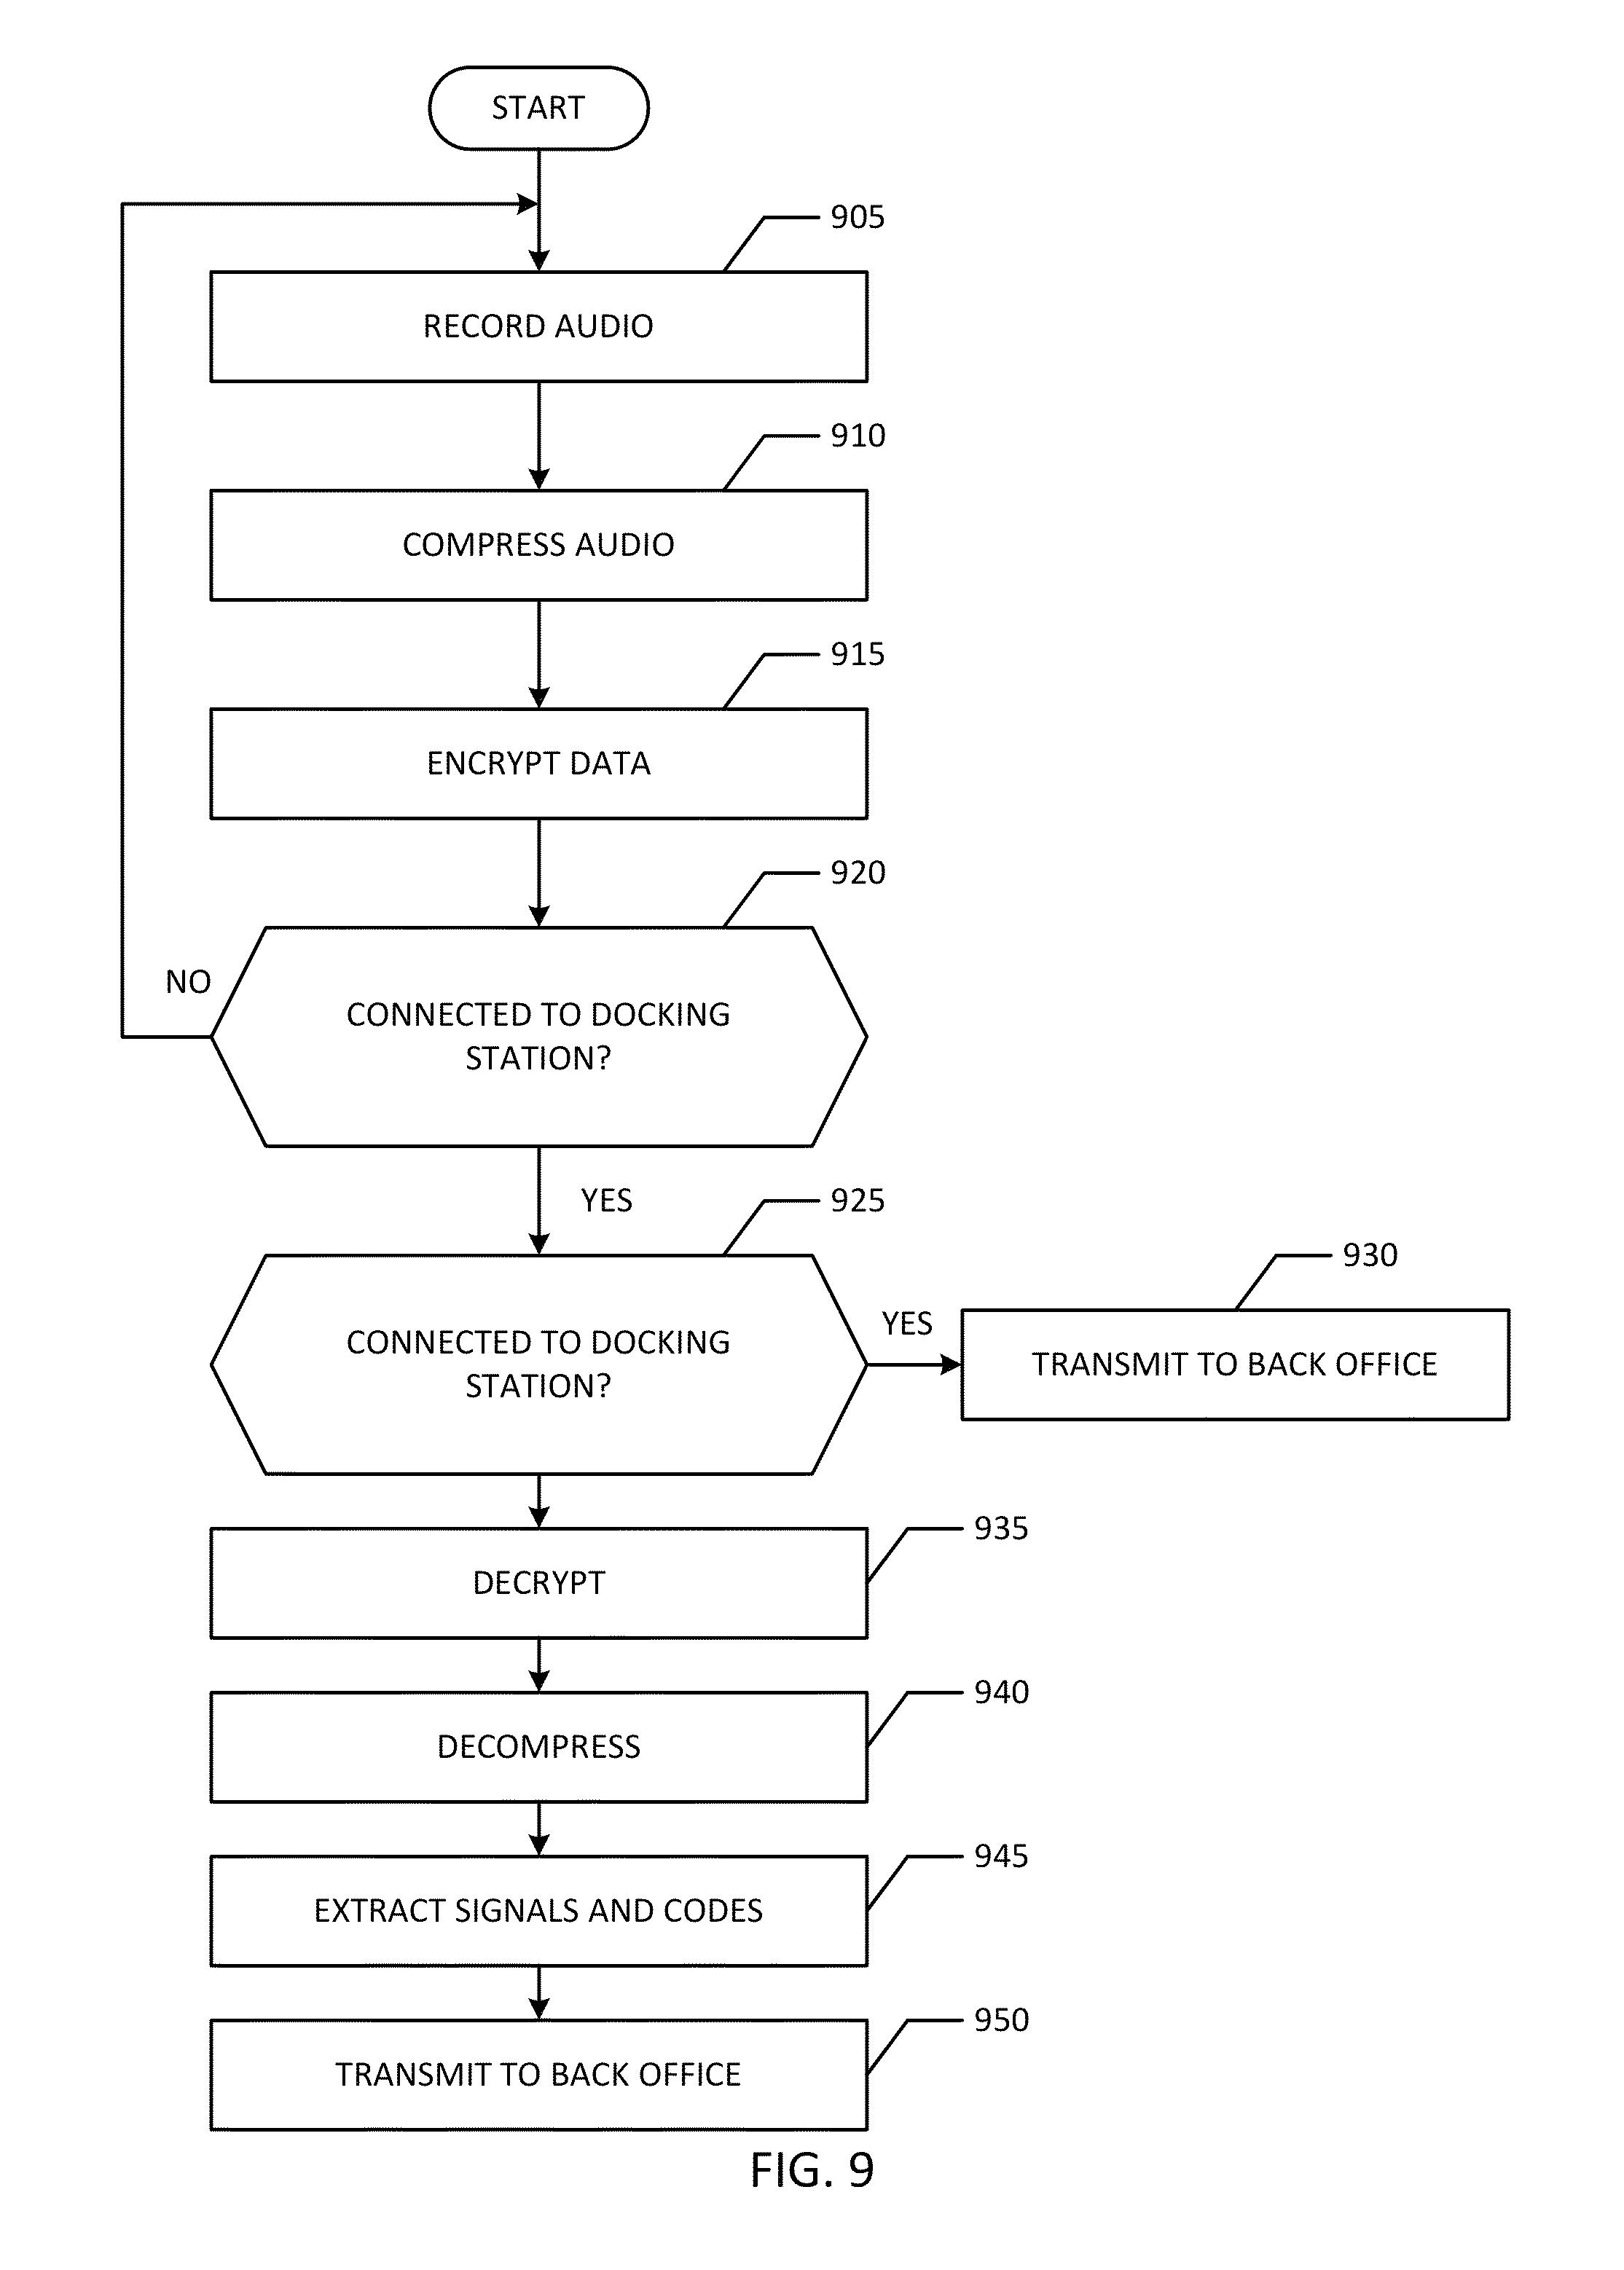 Patent US 9,185,457 B2 on